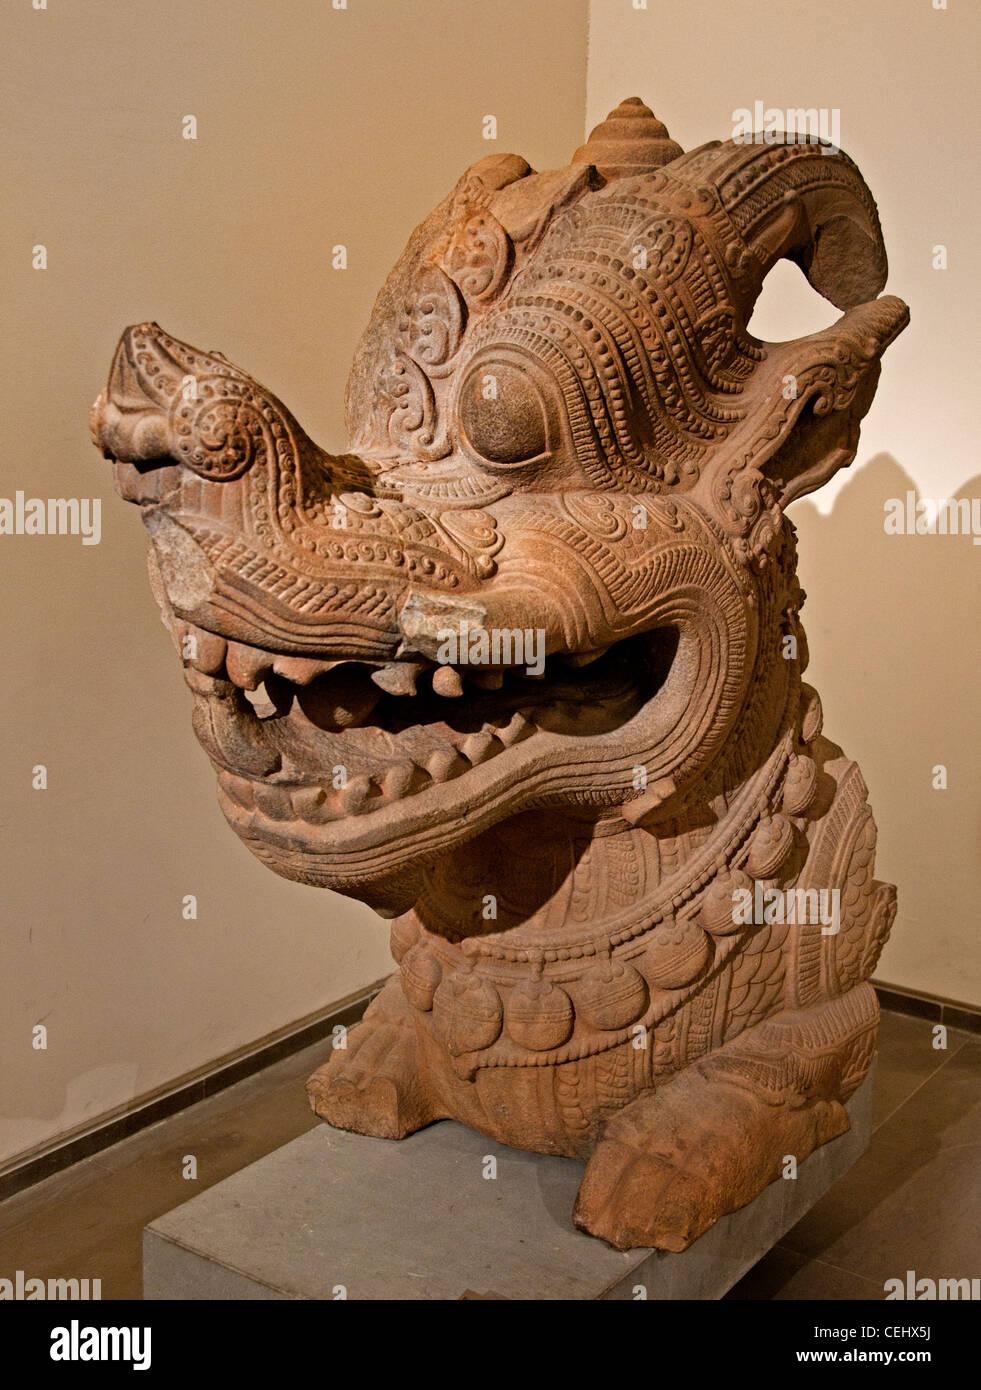 Element of echiffre Makara Dragon 13 Century Vietnam  Thap Mam Province de Binh Dijh style de Thap Mam - Stock Image